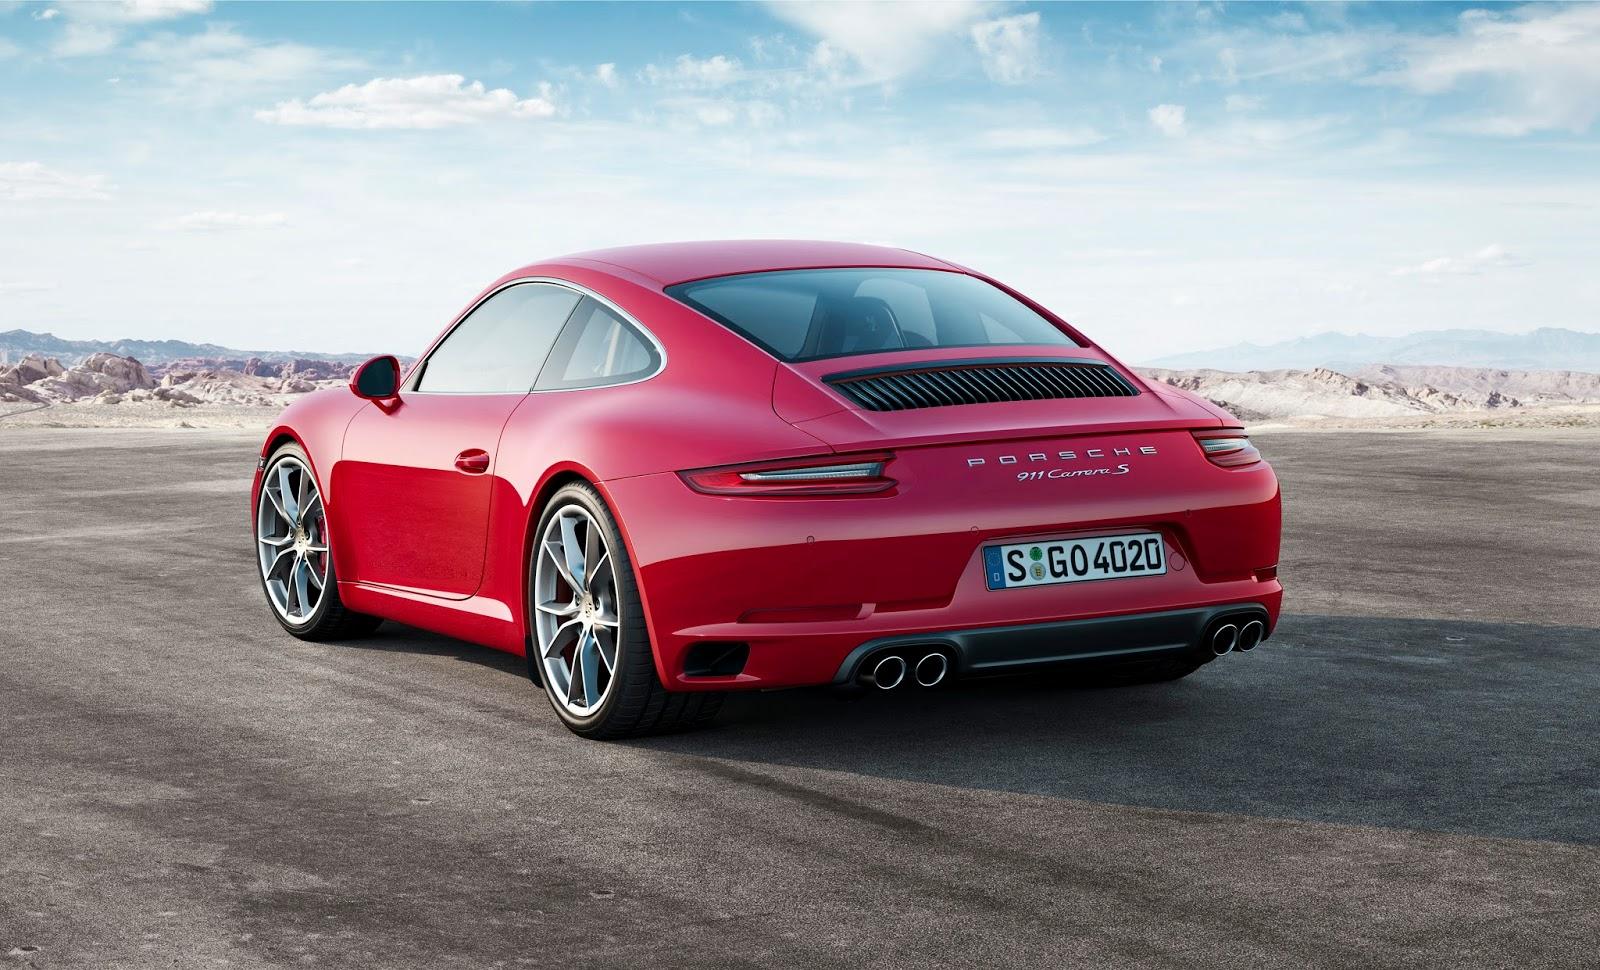 new 2017 porsche 911 same look new turbo engine higher prices gcbc. Black Bedroom Furniture Sets. Home Design Ideas